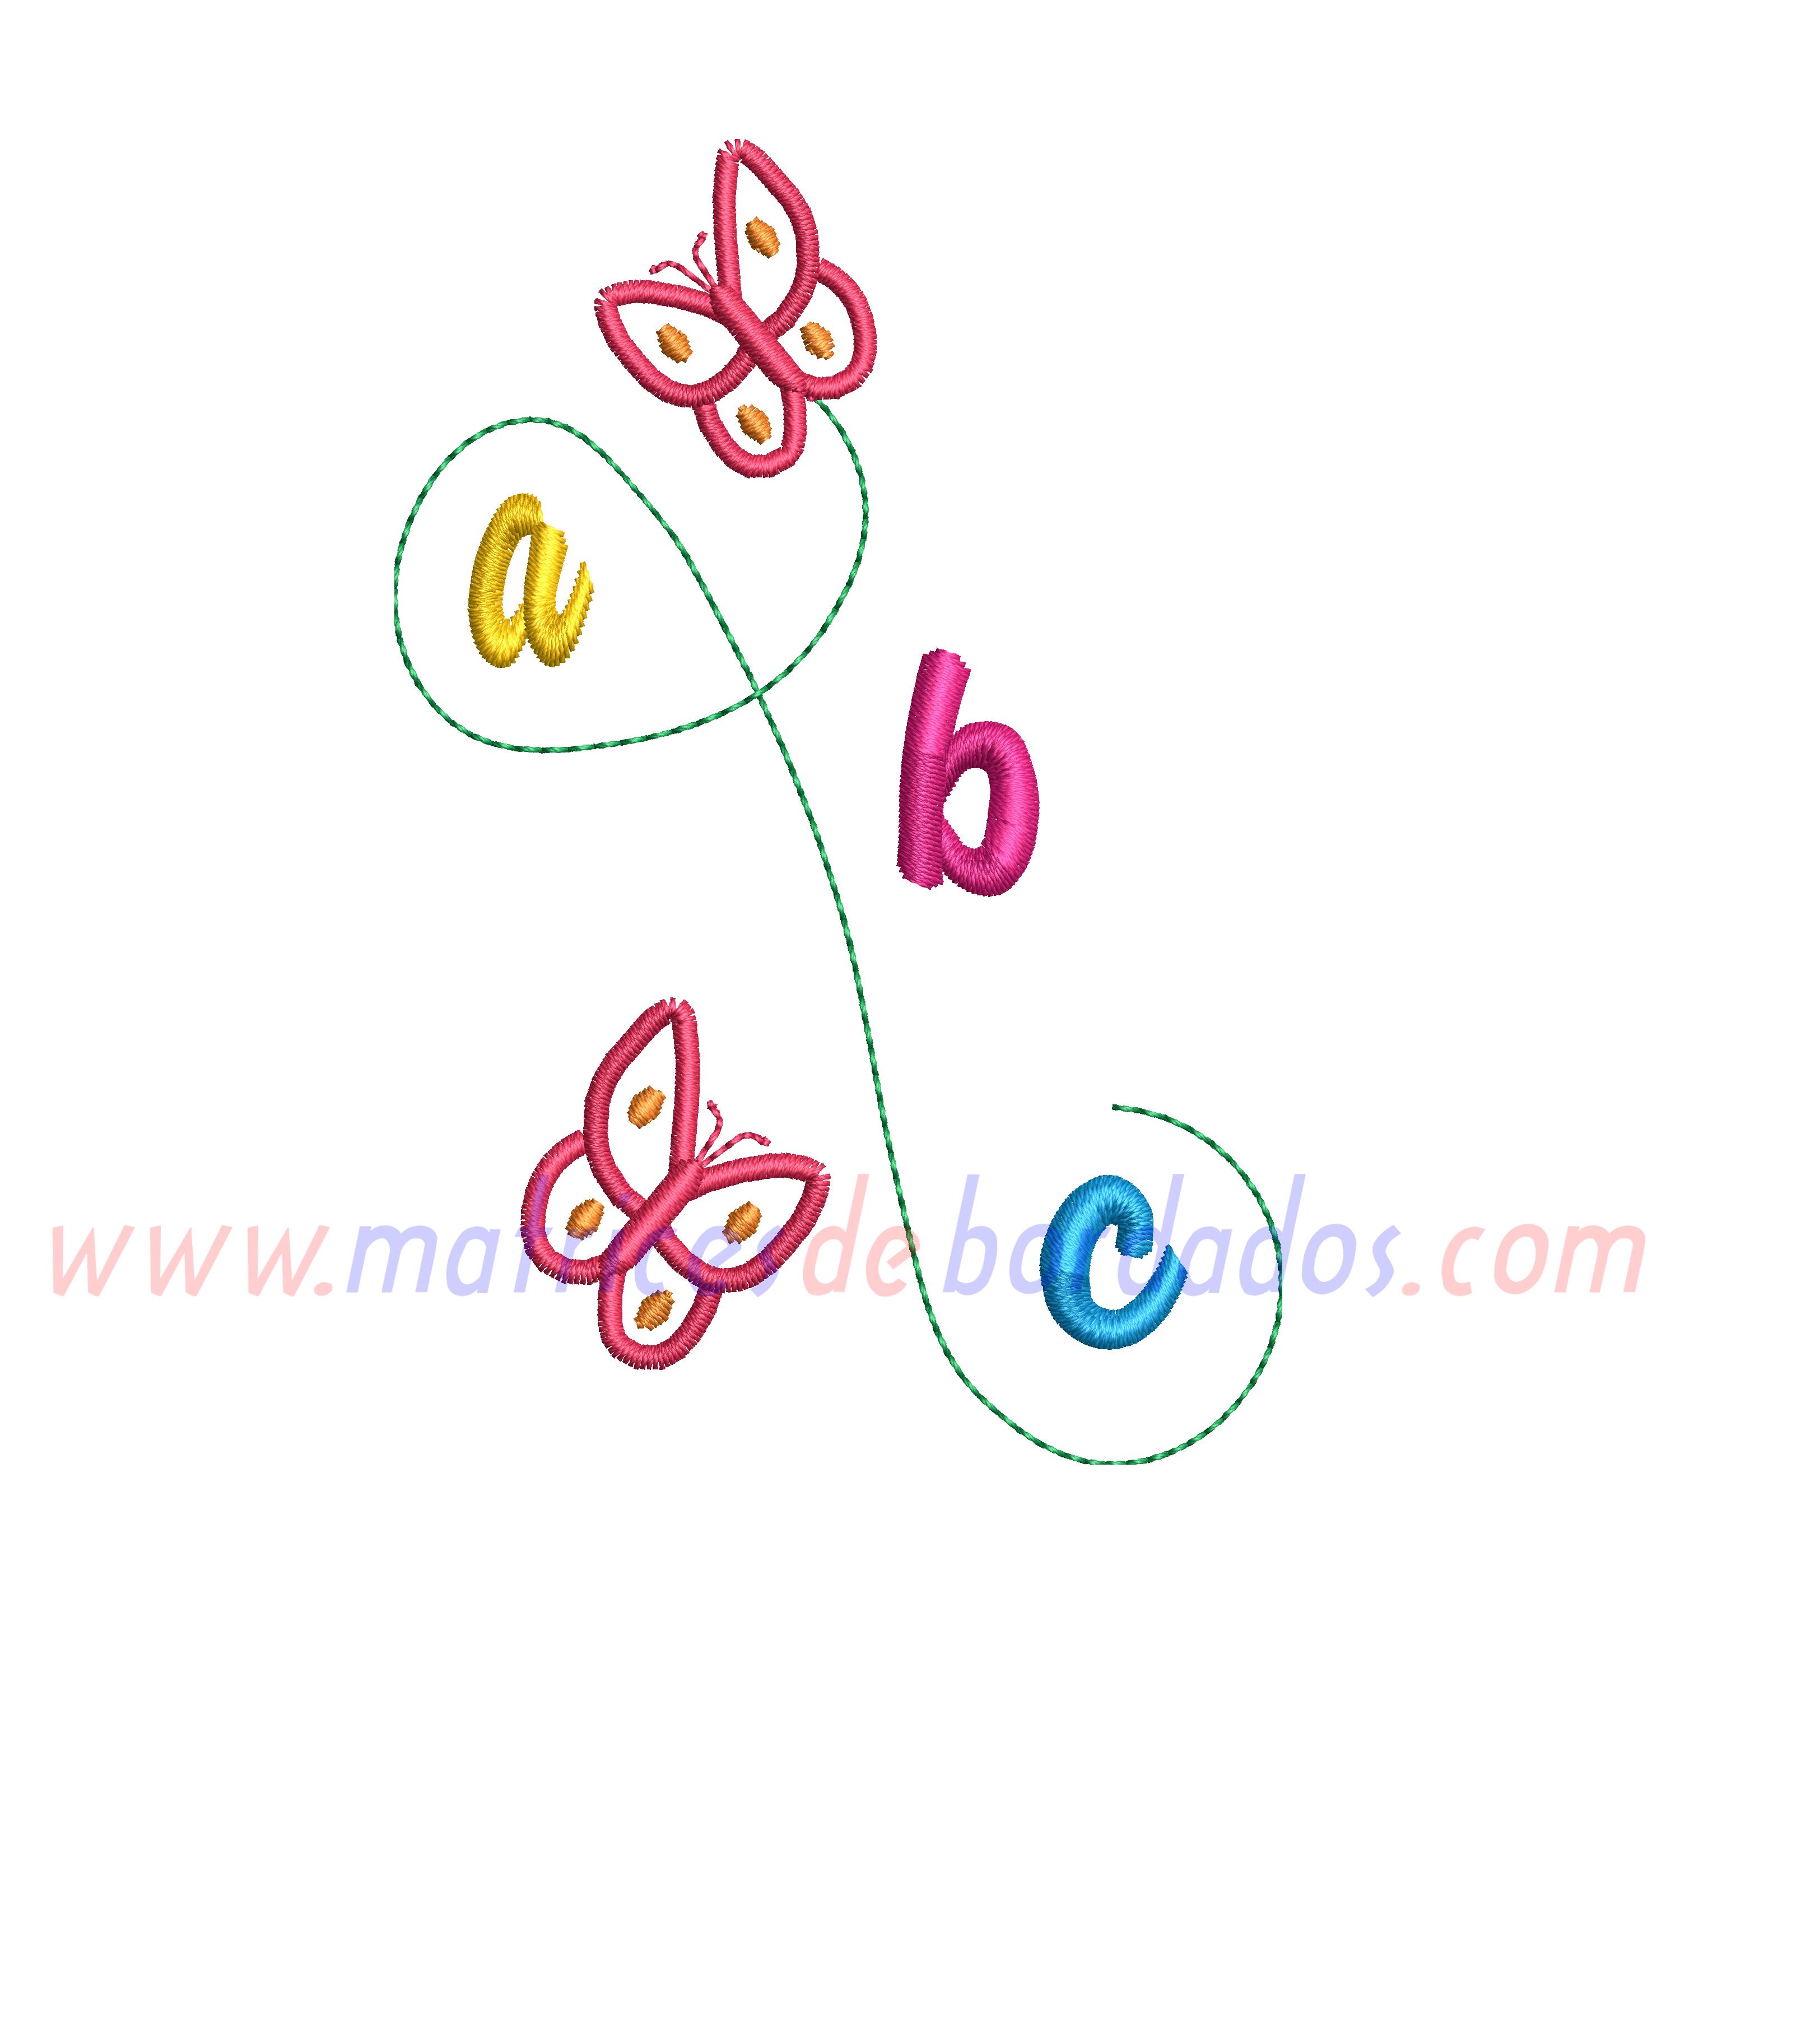 XQ12VN - Abc mariposa